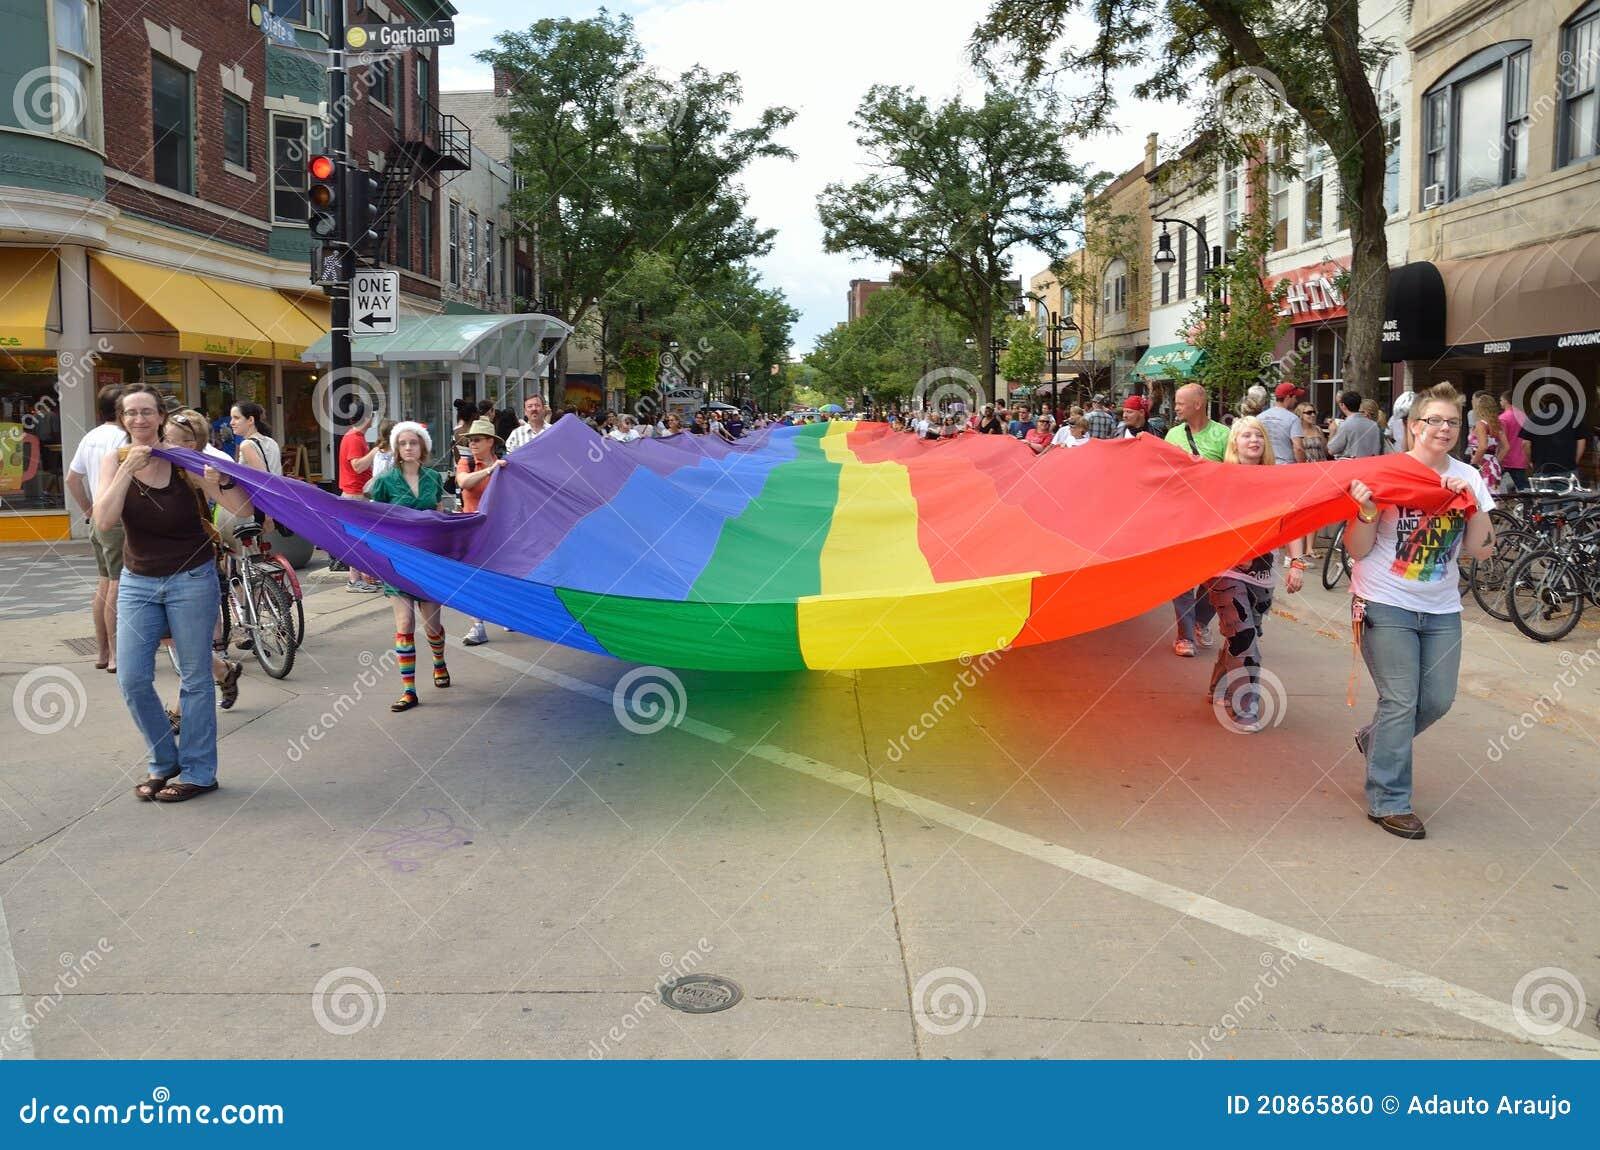 gay male story wanking